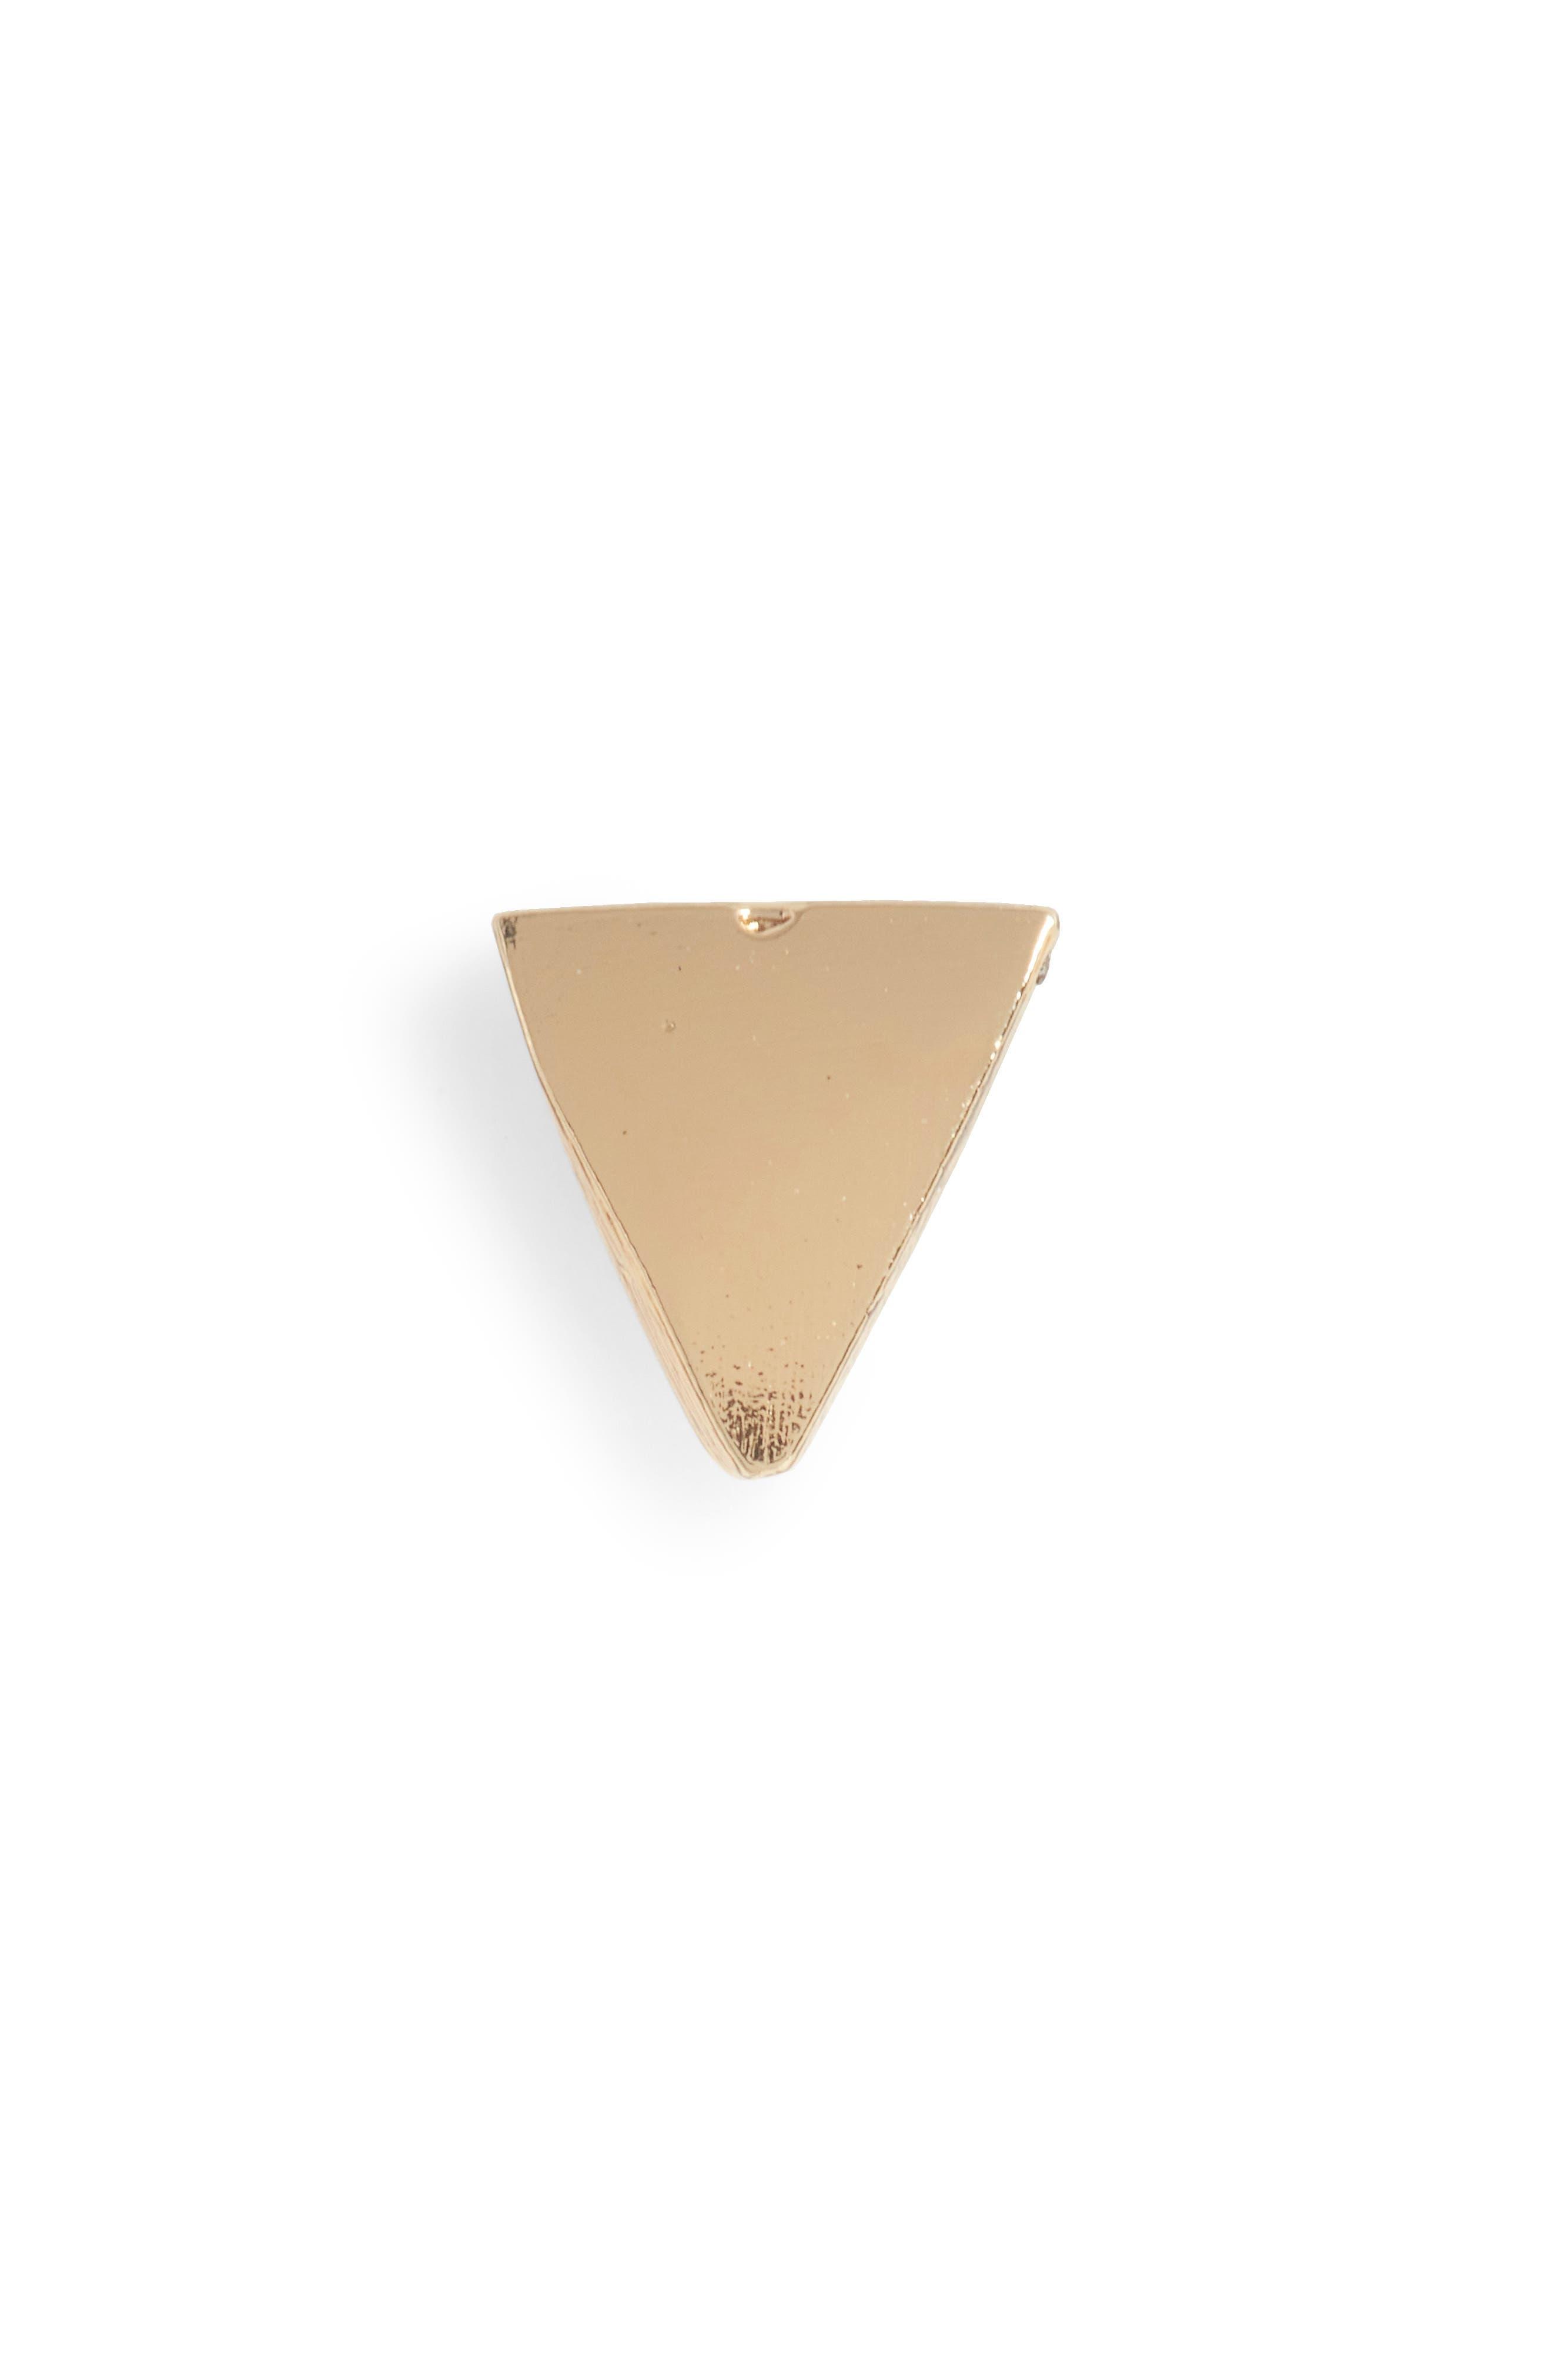 Tiny Triangle Stud Earring